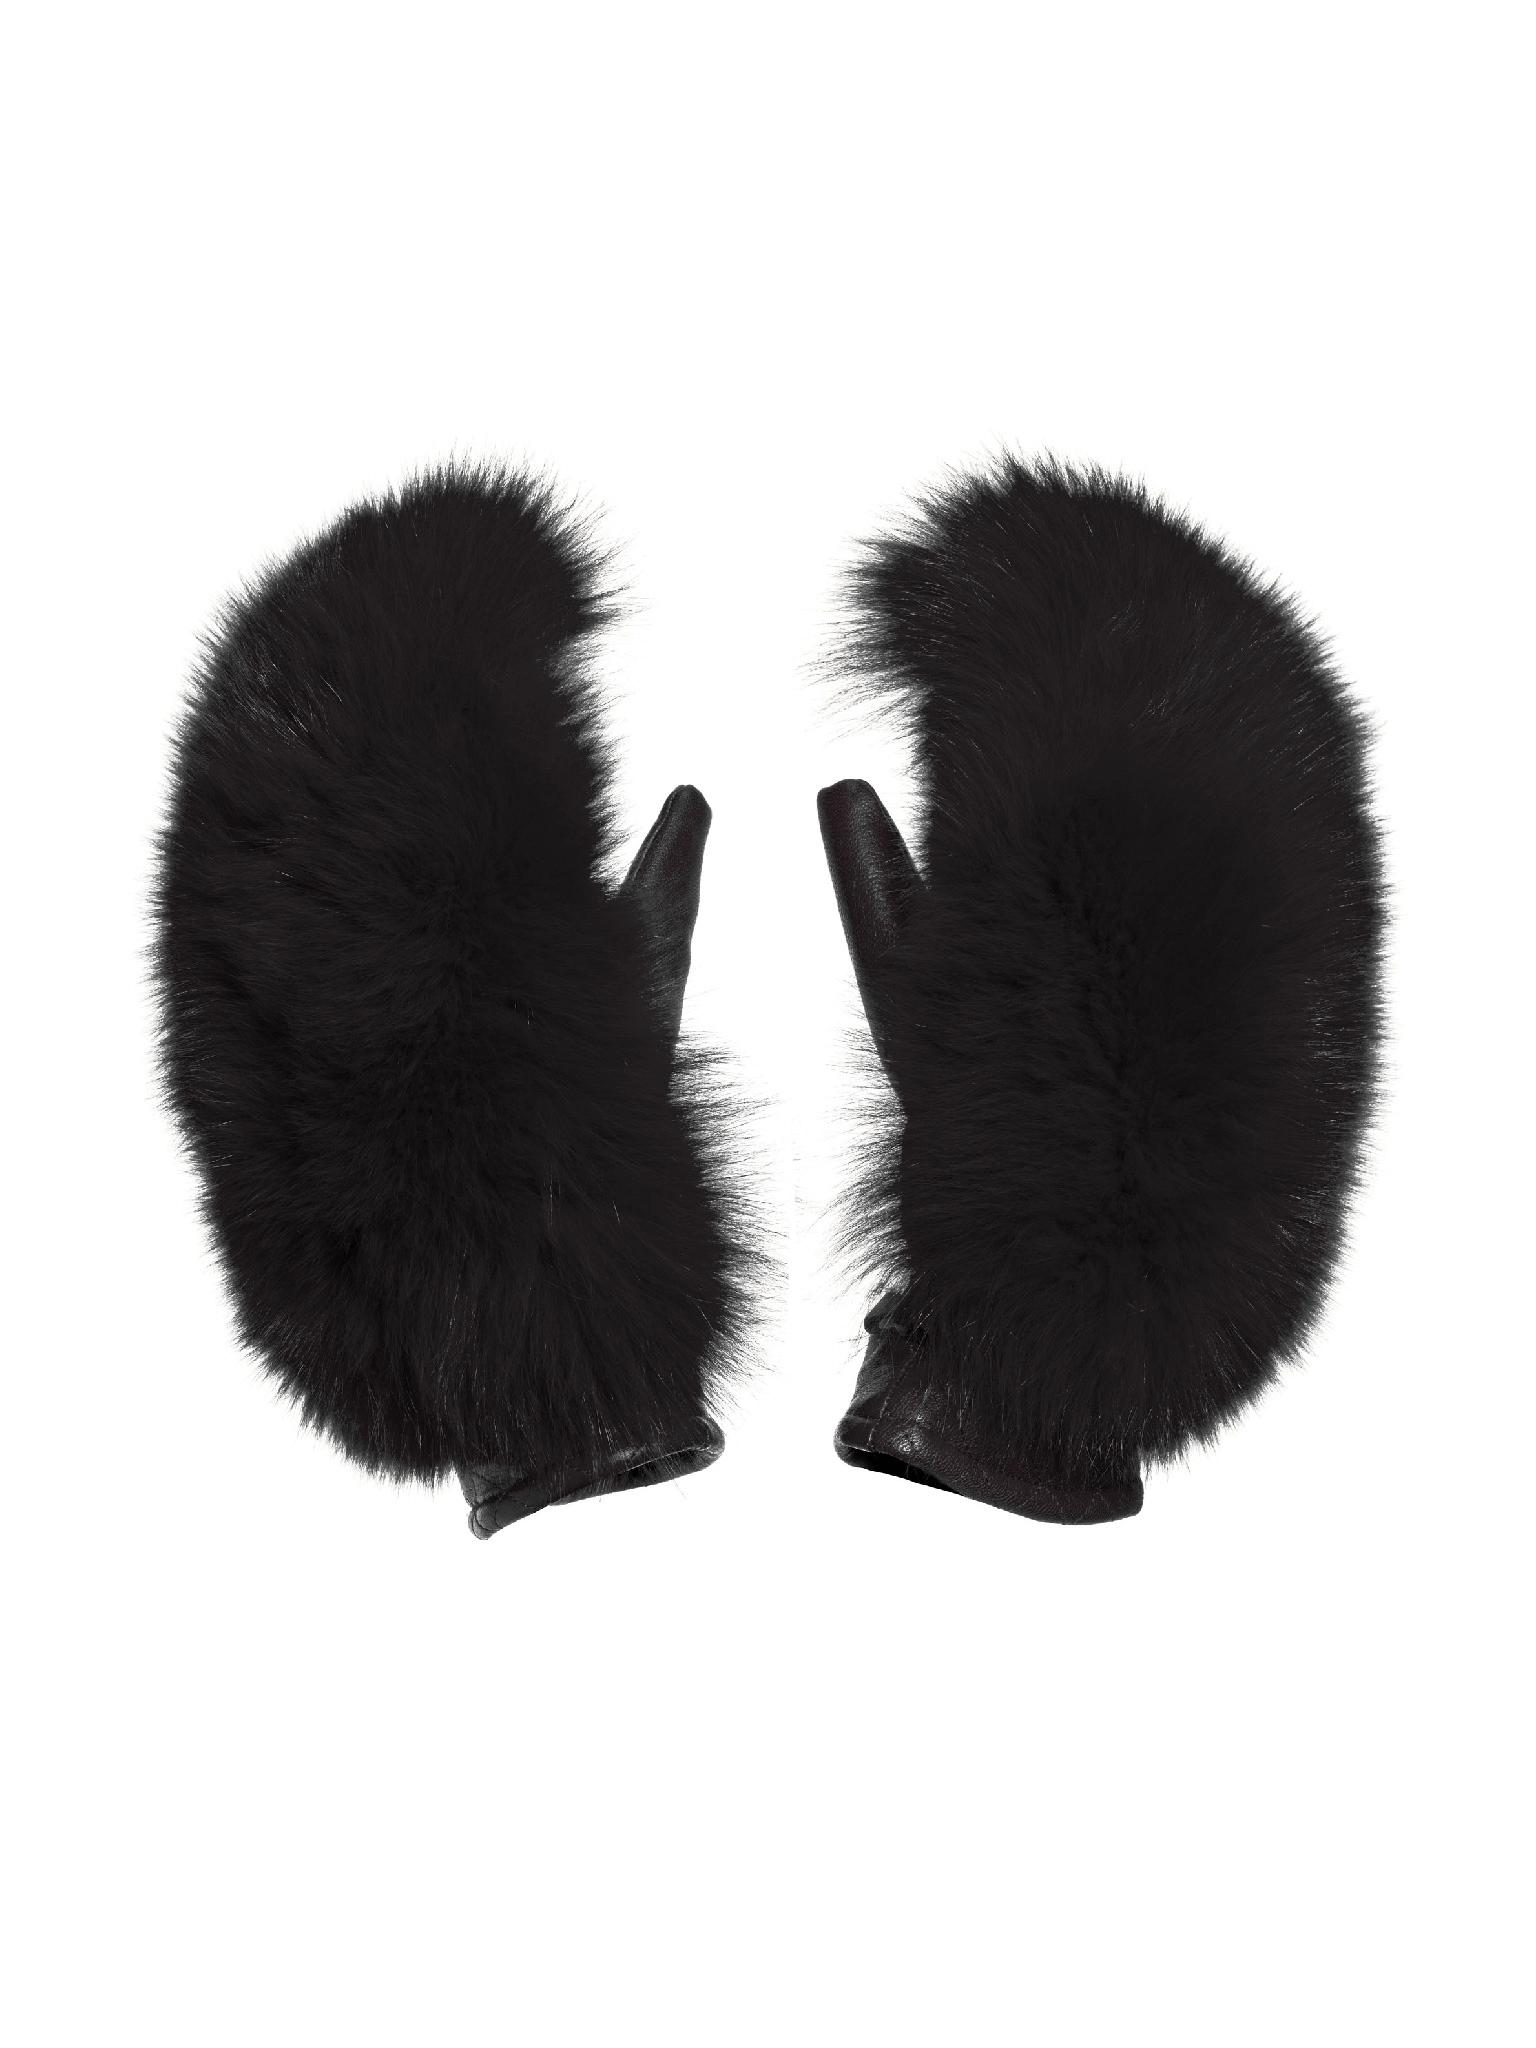 Goldbergh rukavice Hill Mittens Faux Fur black Velikost: 6.5